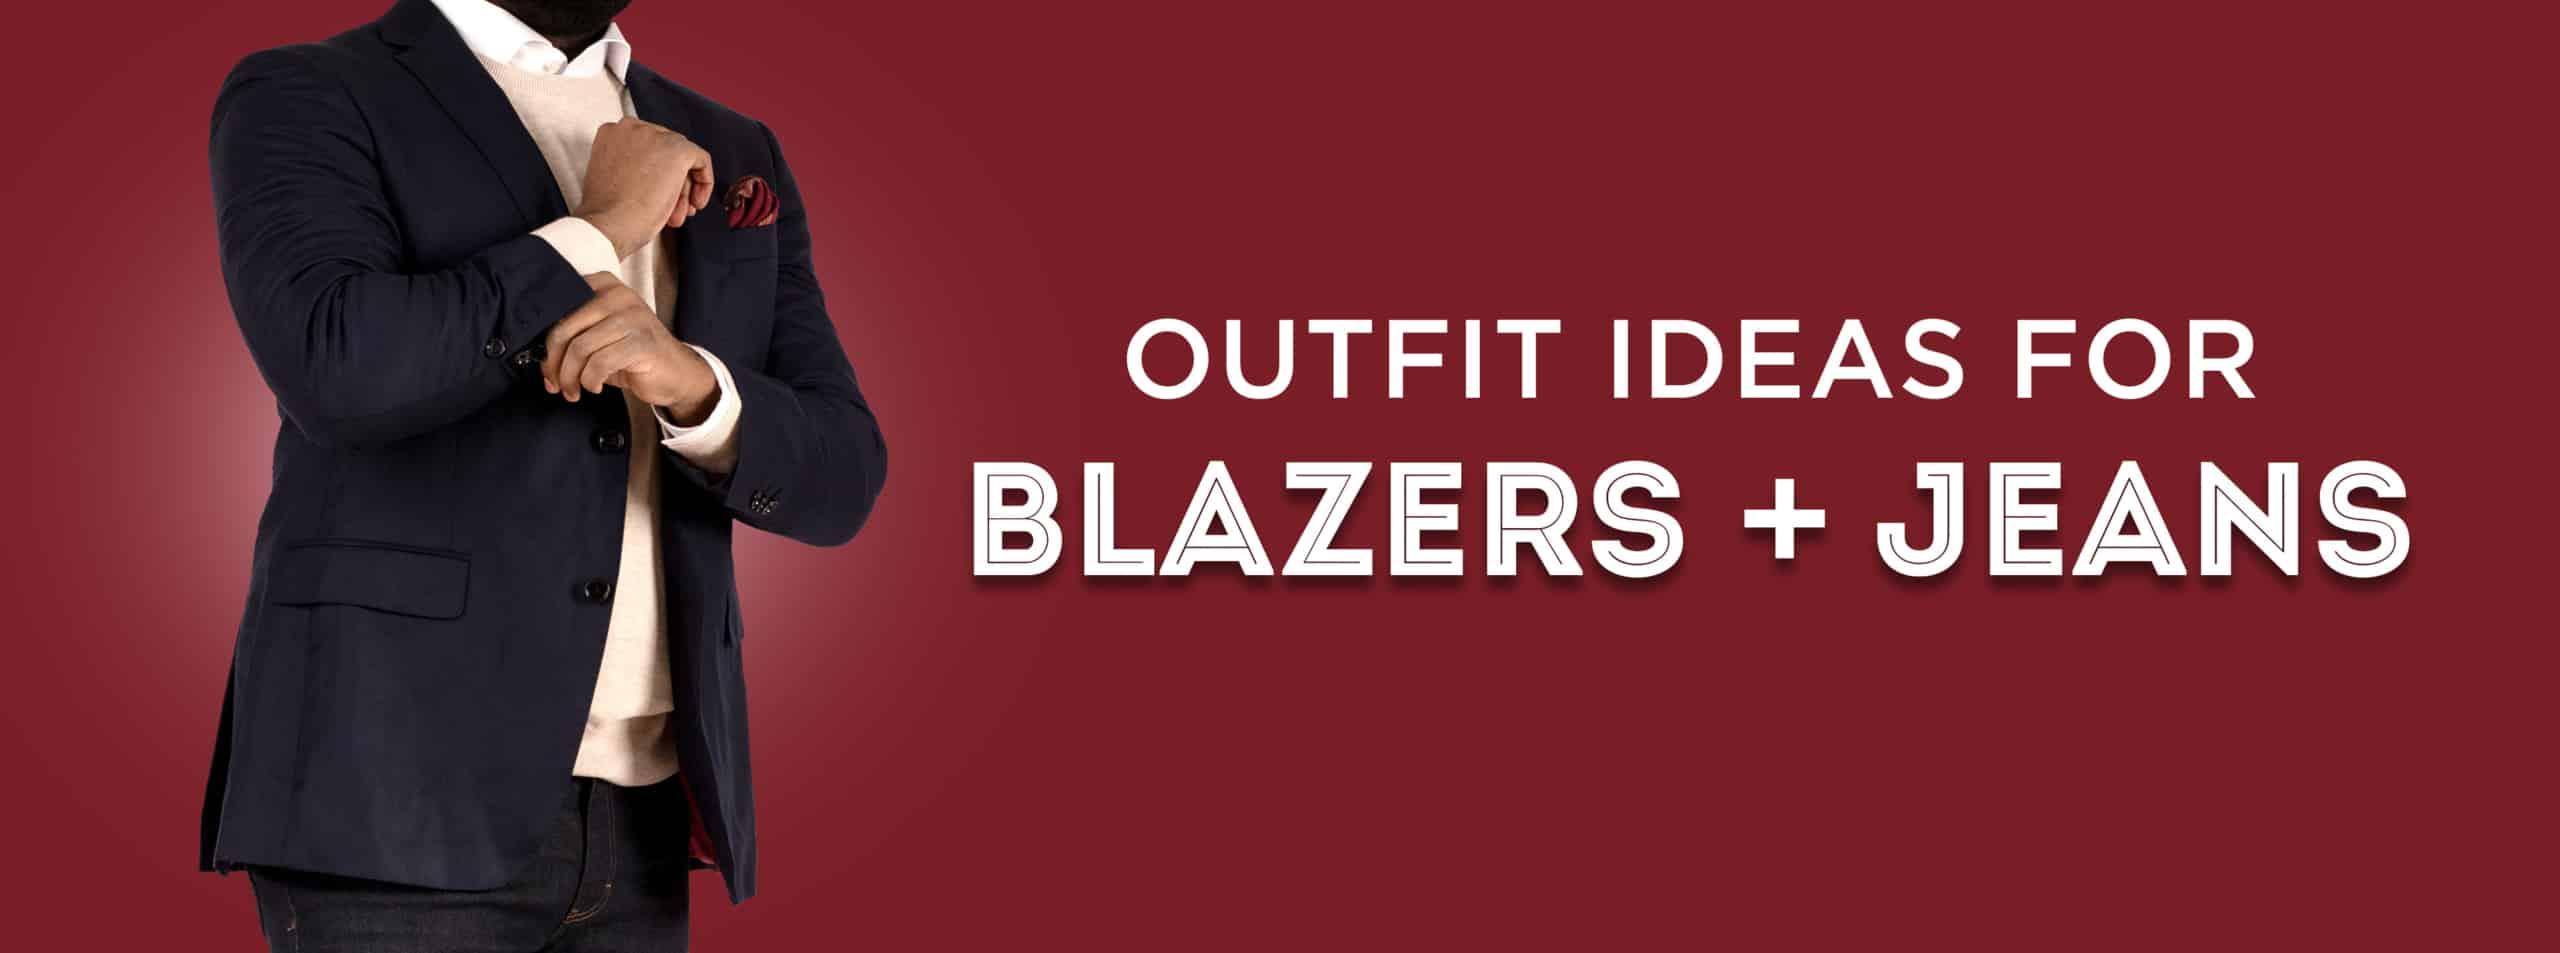 Jackets & Jeans: Menswear Combinations for Blazers, Sport Coats & Denim